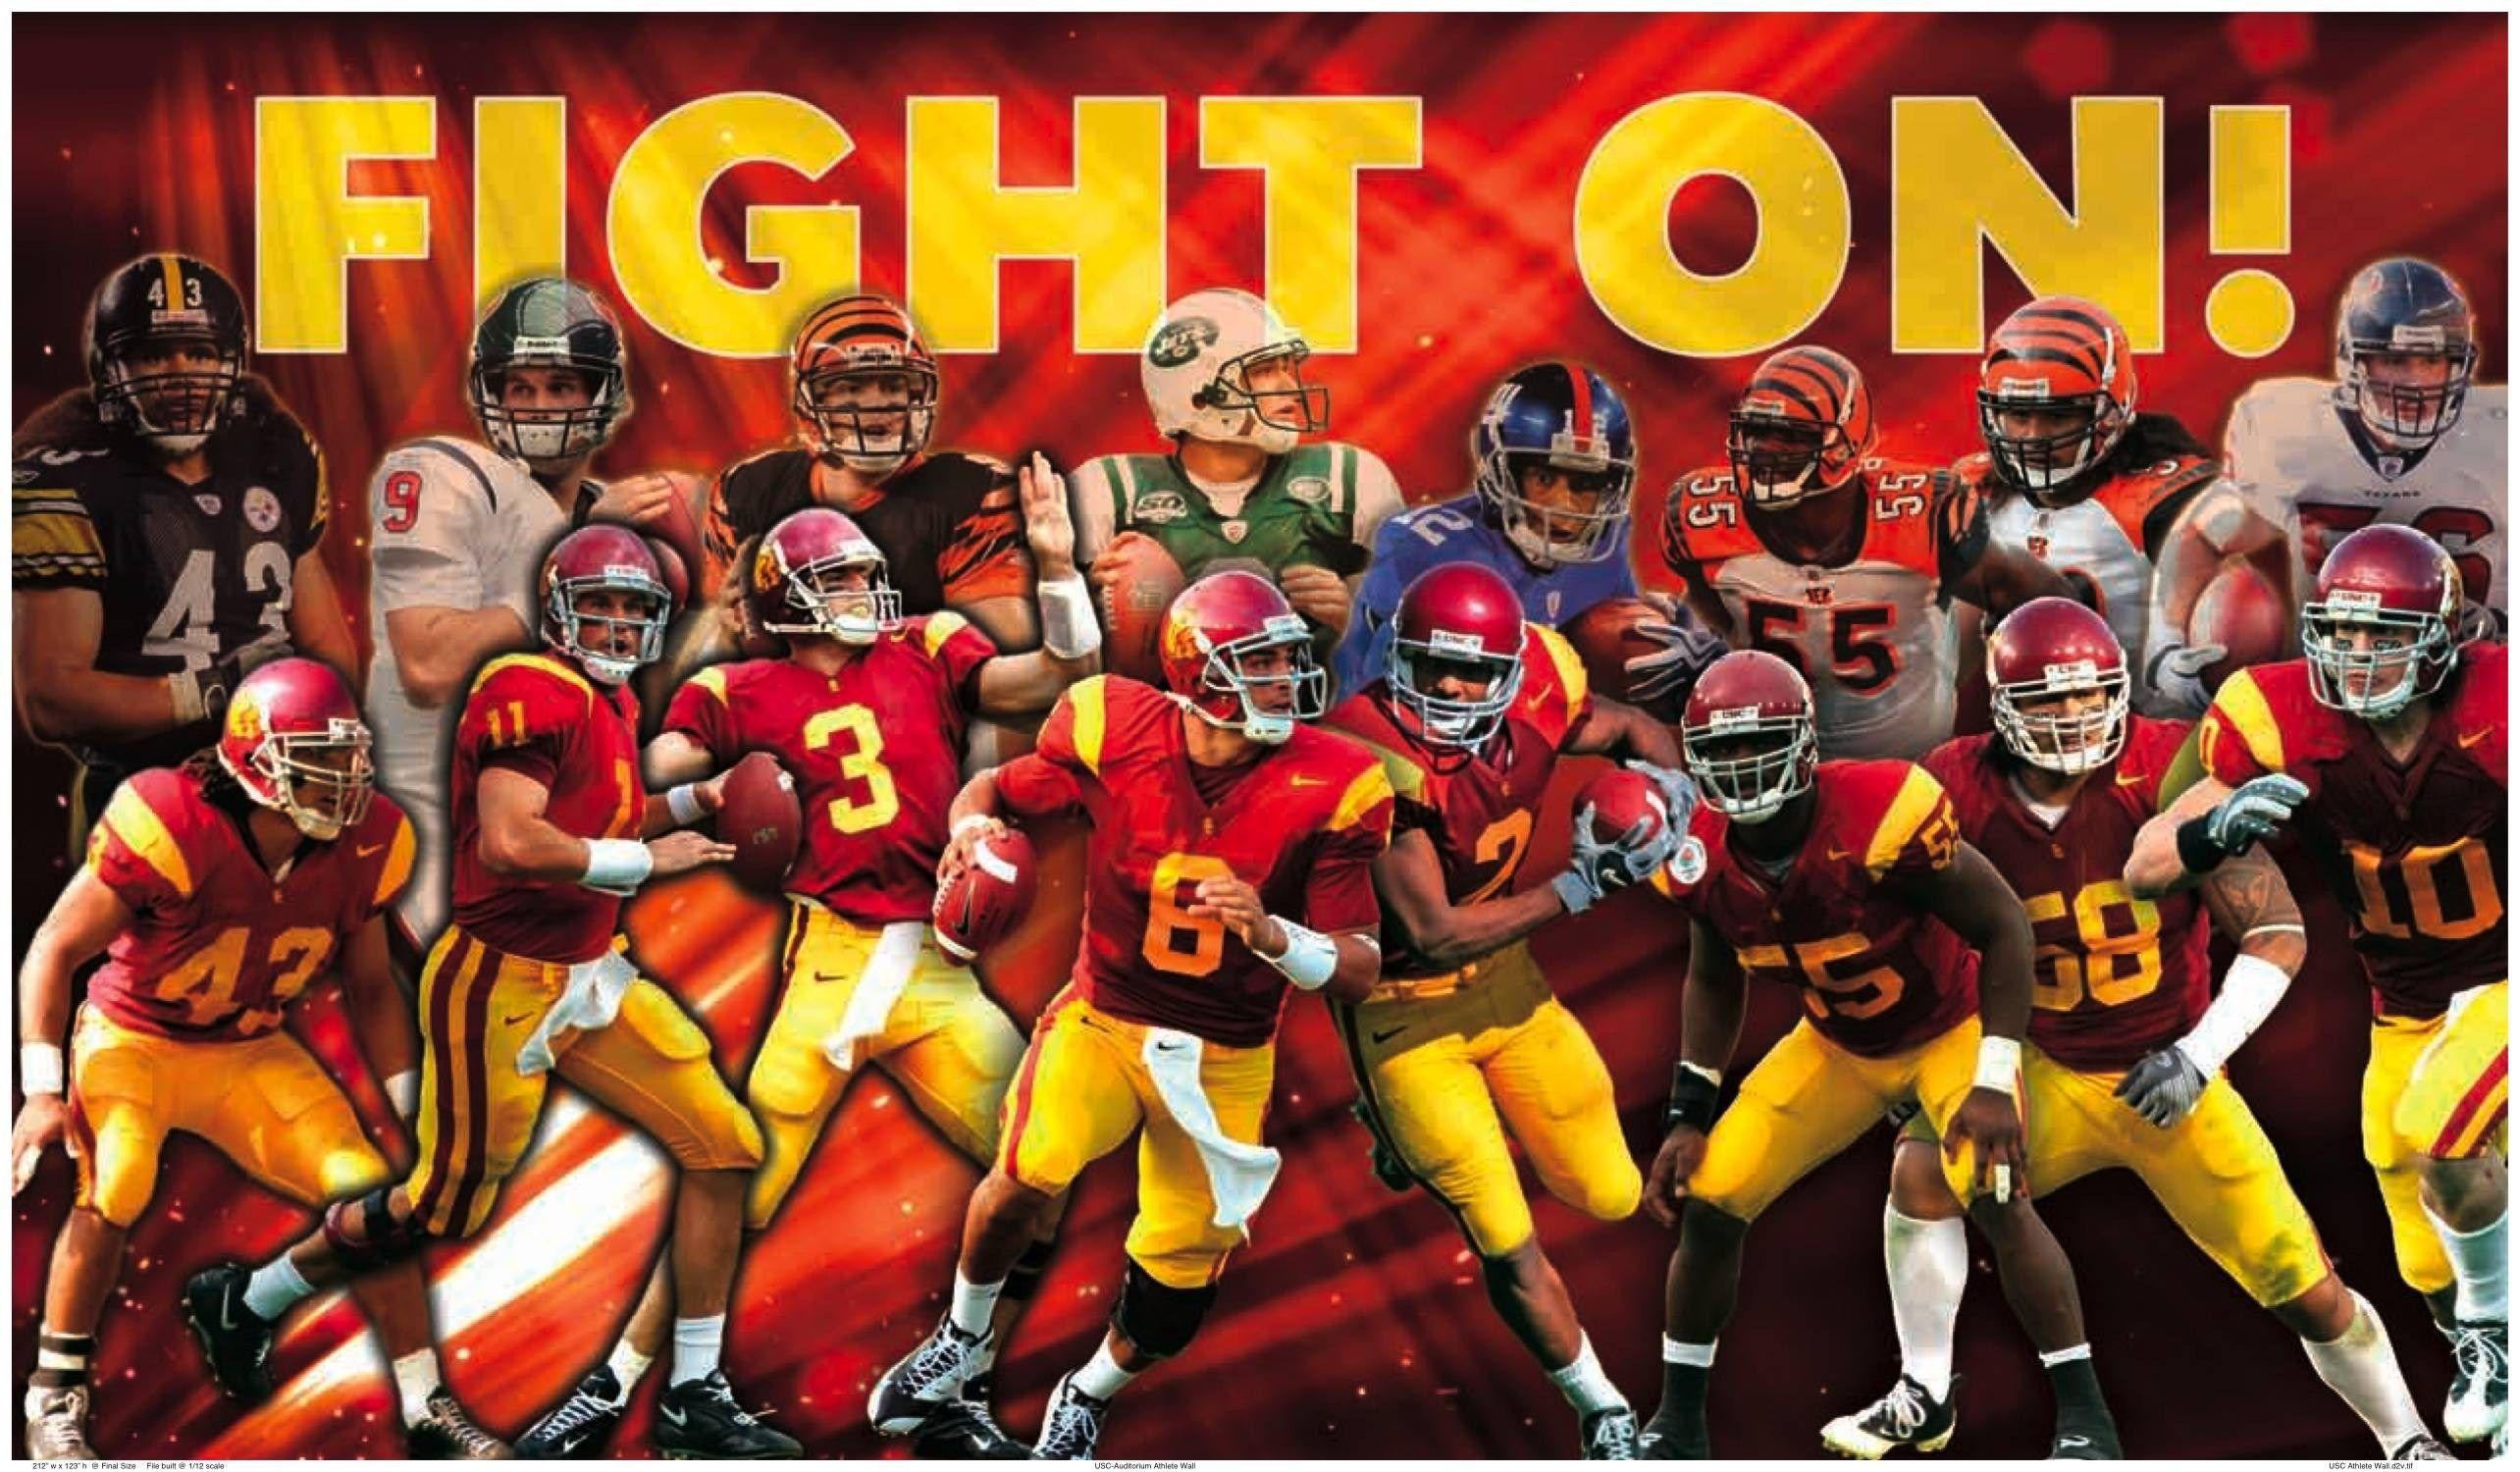 Usc Football Hd Wallpapers Footballncaateamwallpaper Usc Football Usc Trojans Football Trojans Football